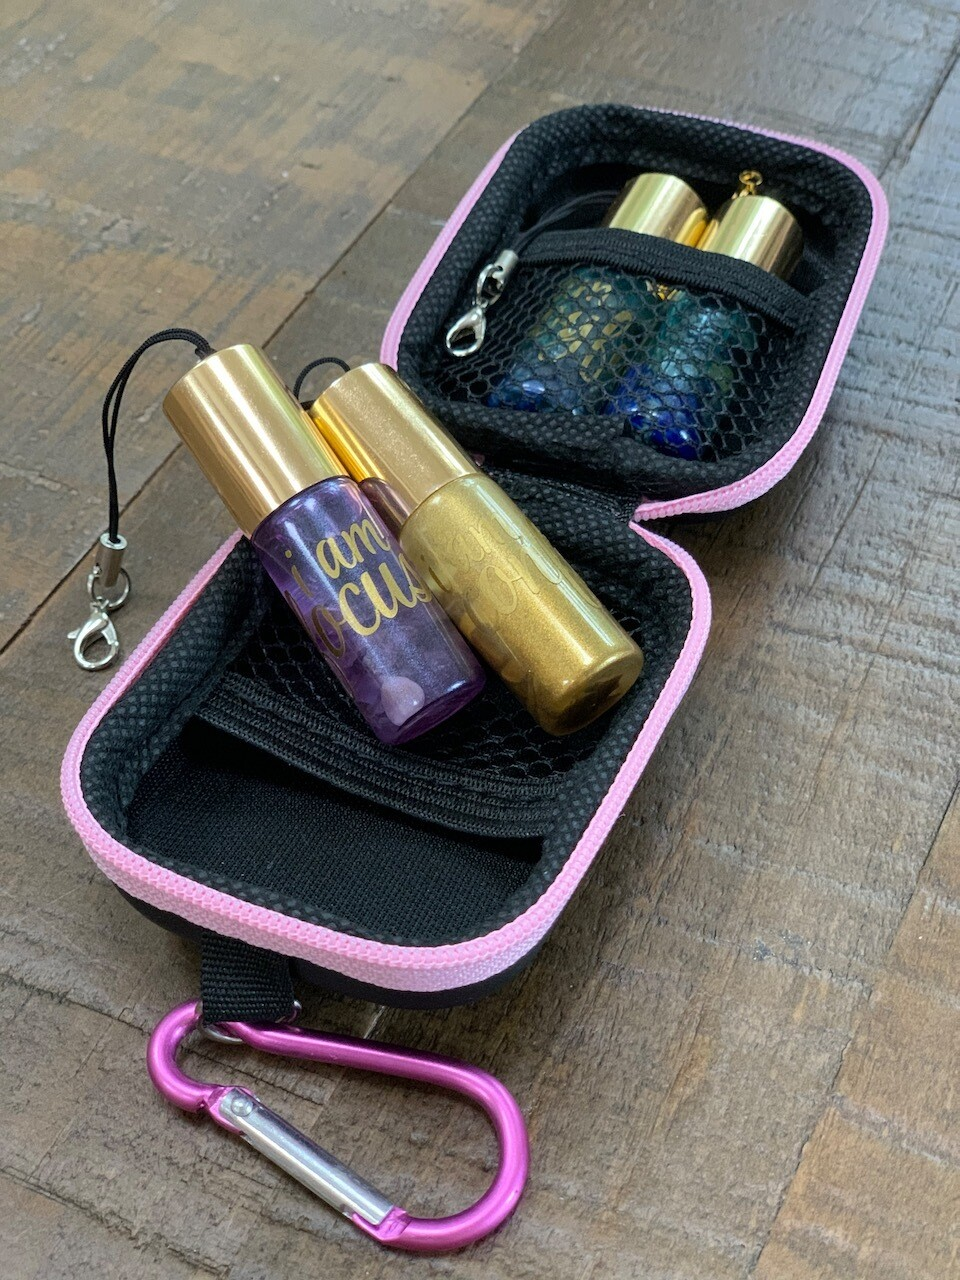 3 ml-Travel-Sized Emotional Healing Elixirs Kit